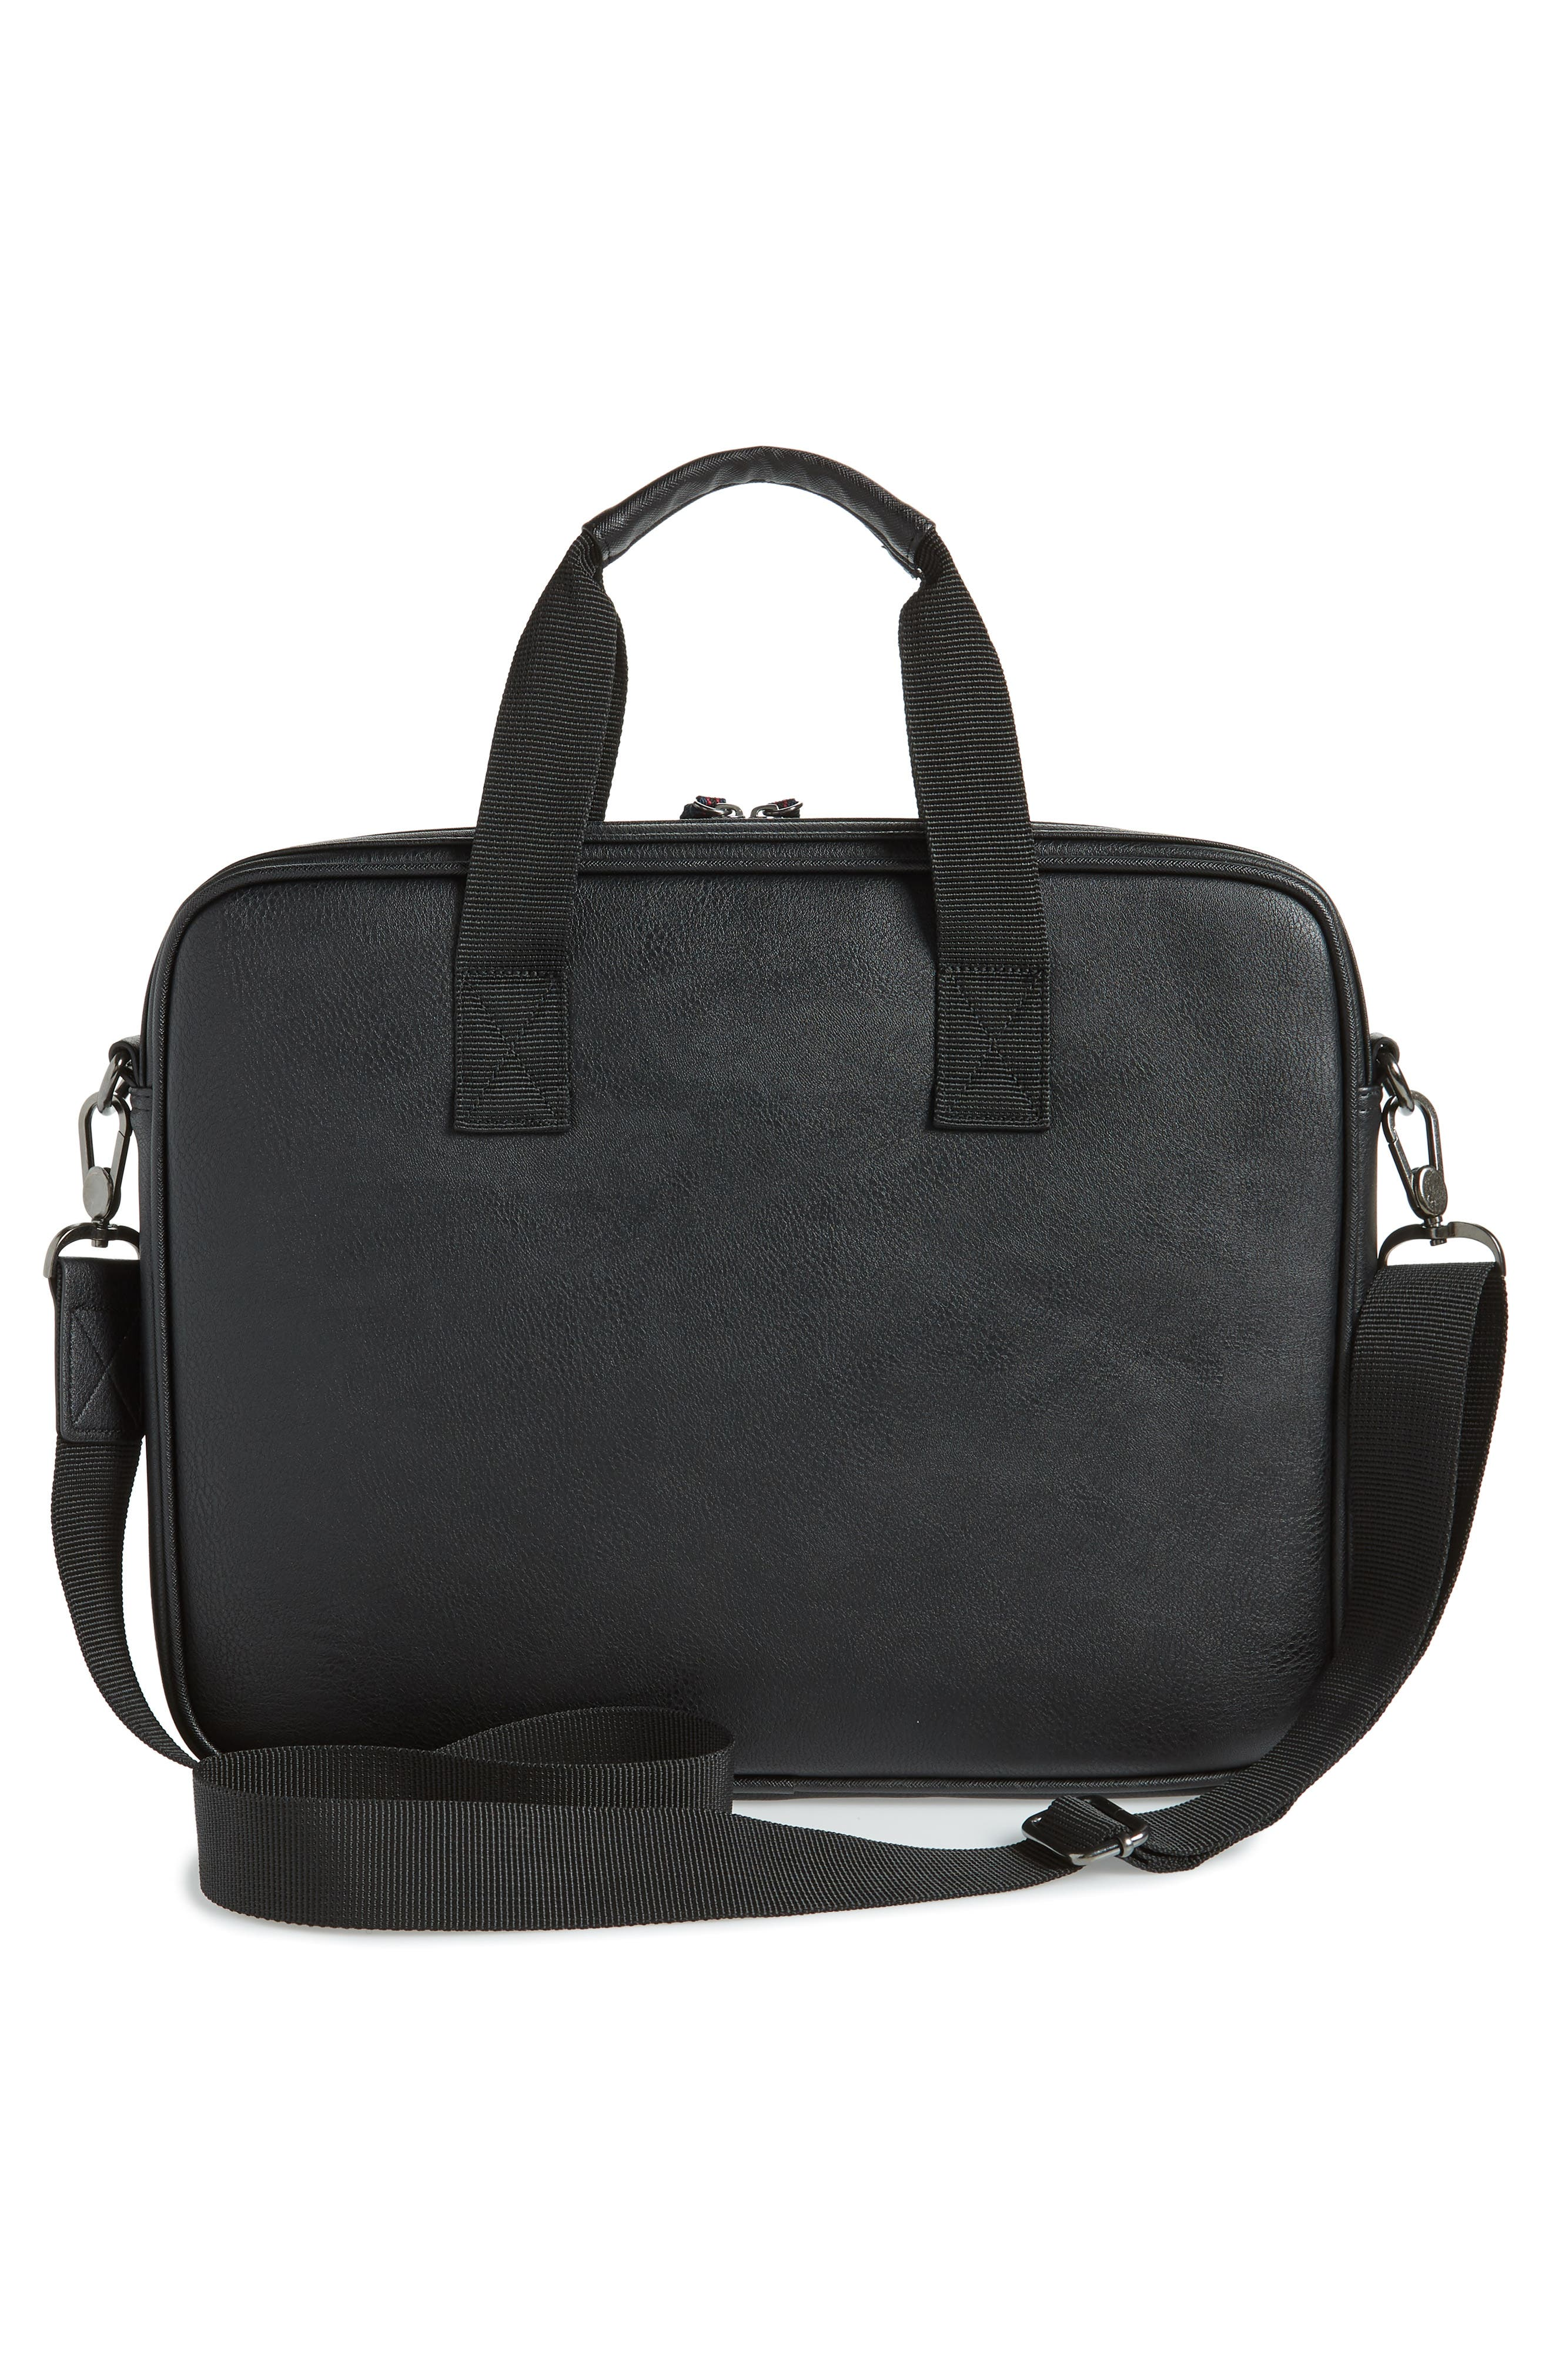 TED BAKER LONDON, Faux Leather Document Bag, Alternate thumbnail 3, color, BLACK